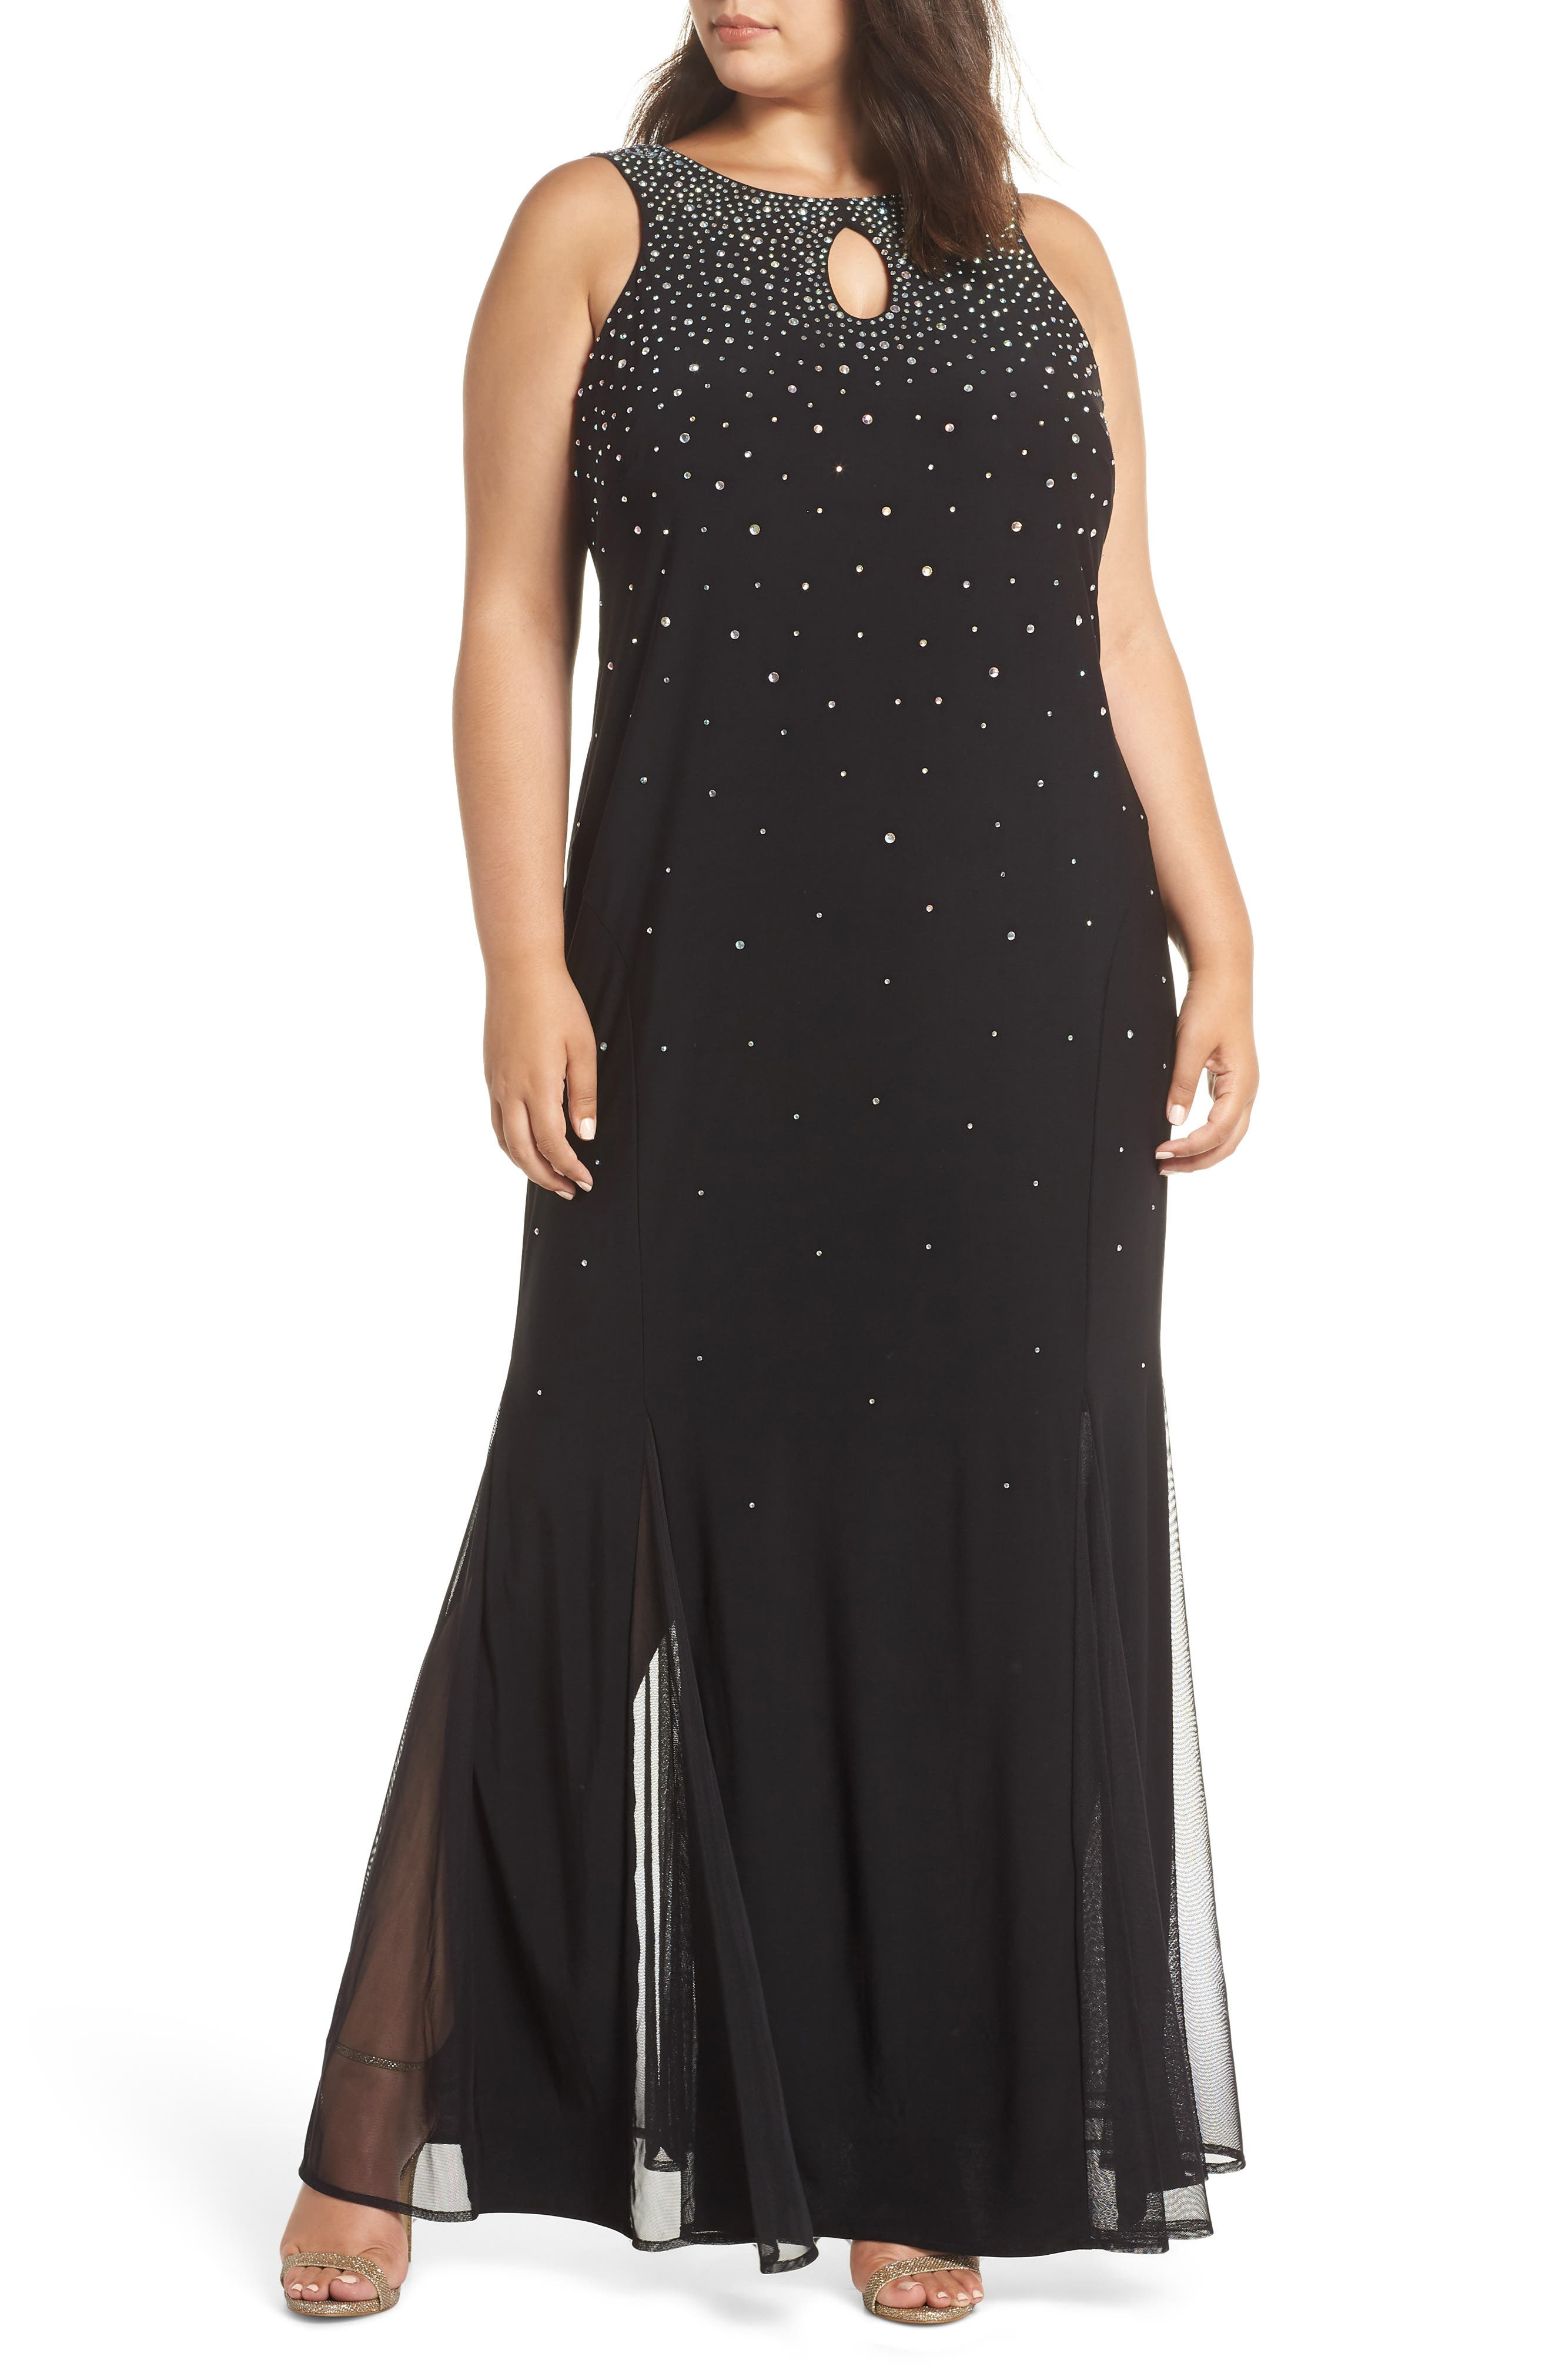 MORGAN & CO. Rhinestone Trumpet Gown, Main, color, BLACK